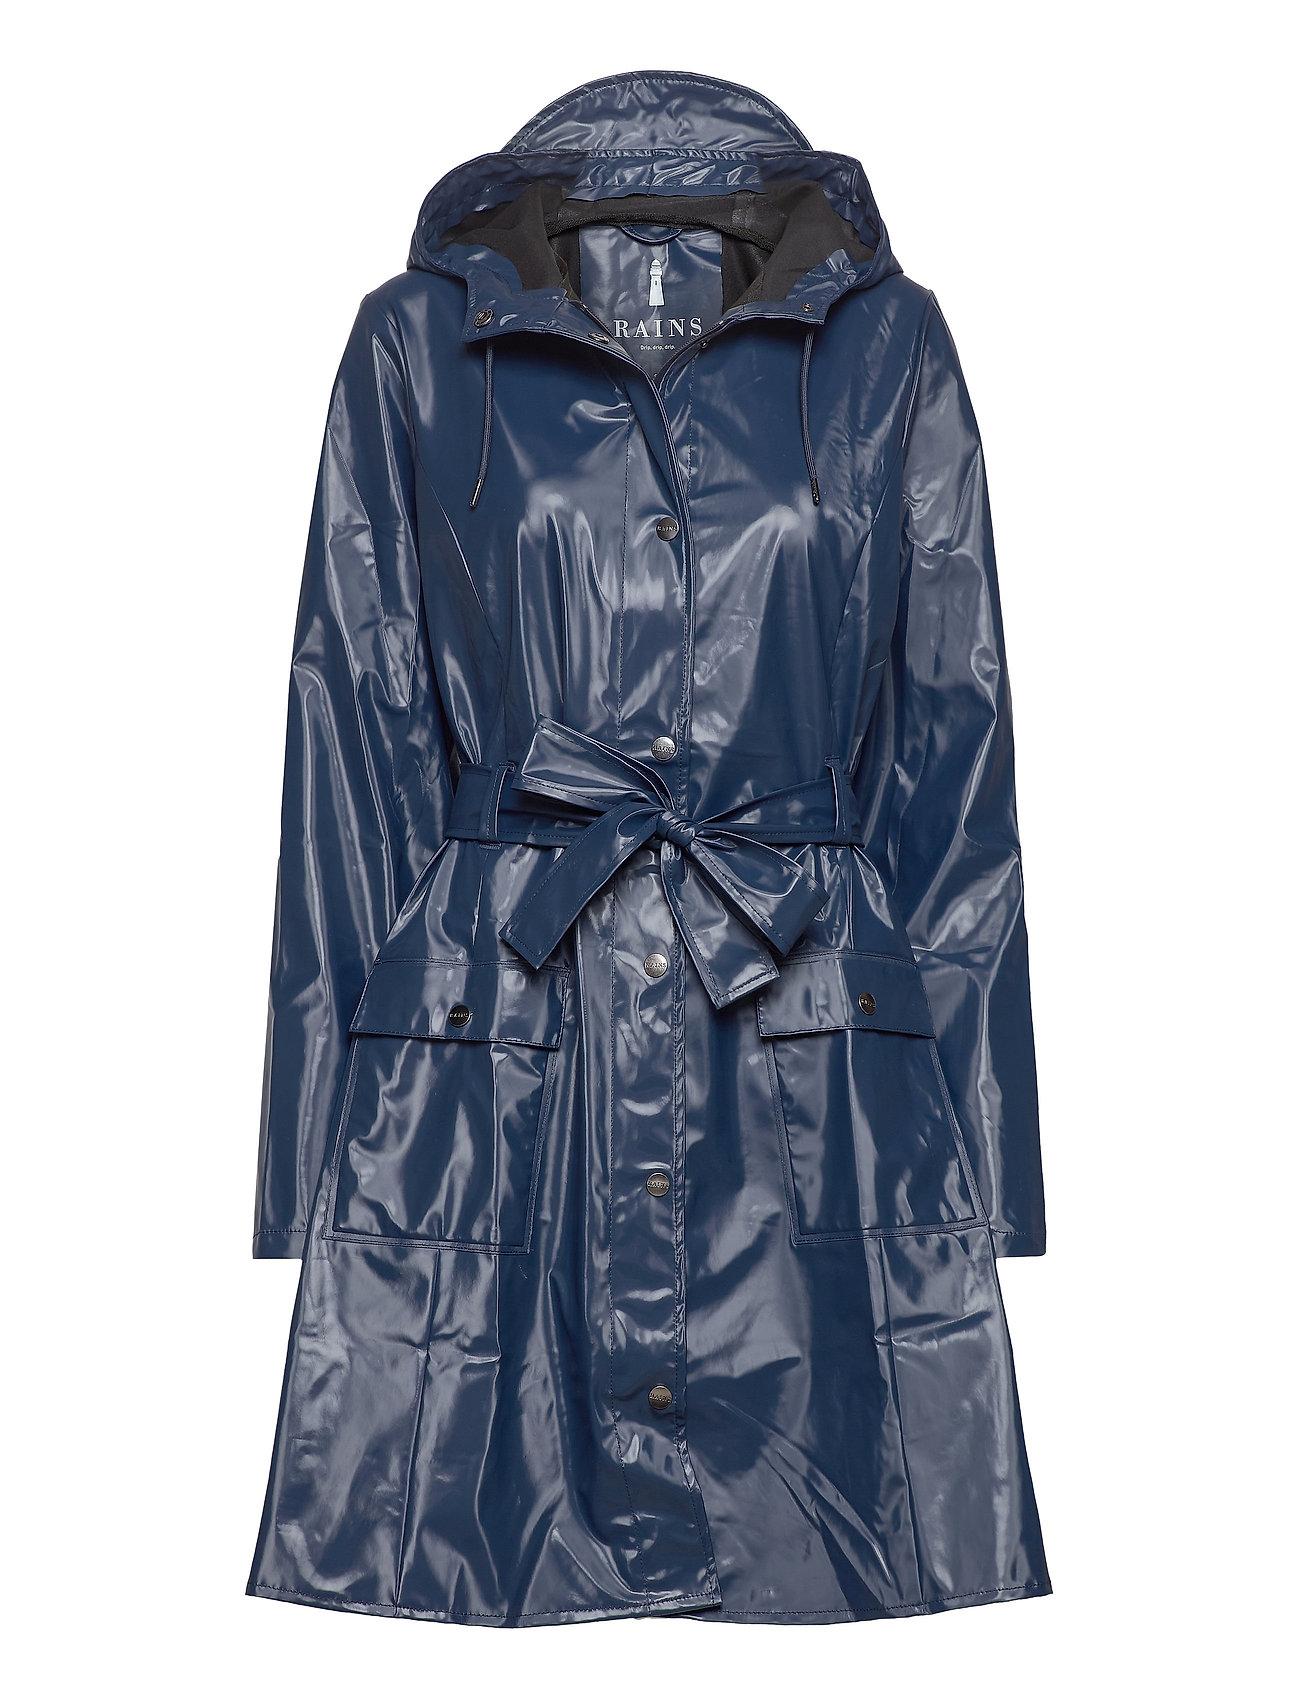 Rains Curve Jacket - 07 SHINY BLUE